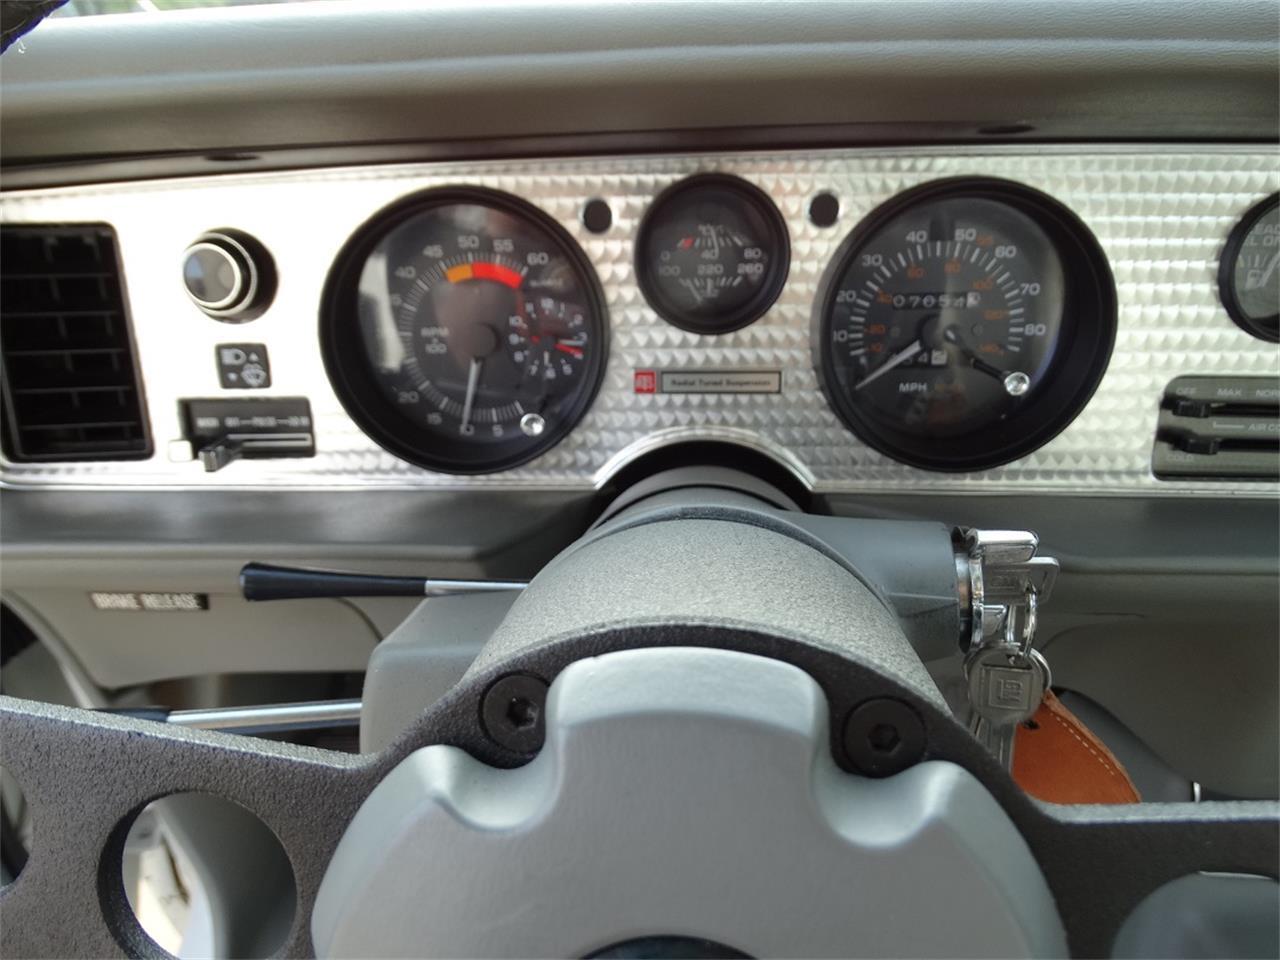 1980 Pontiac Firebird Trans Am Turbo Indy Pace Car Edition (CC-1194837) for sale in Dallas, Texas